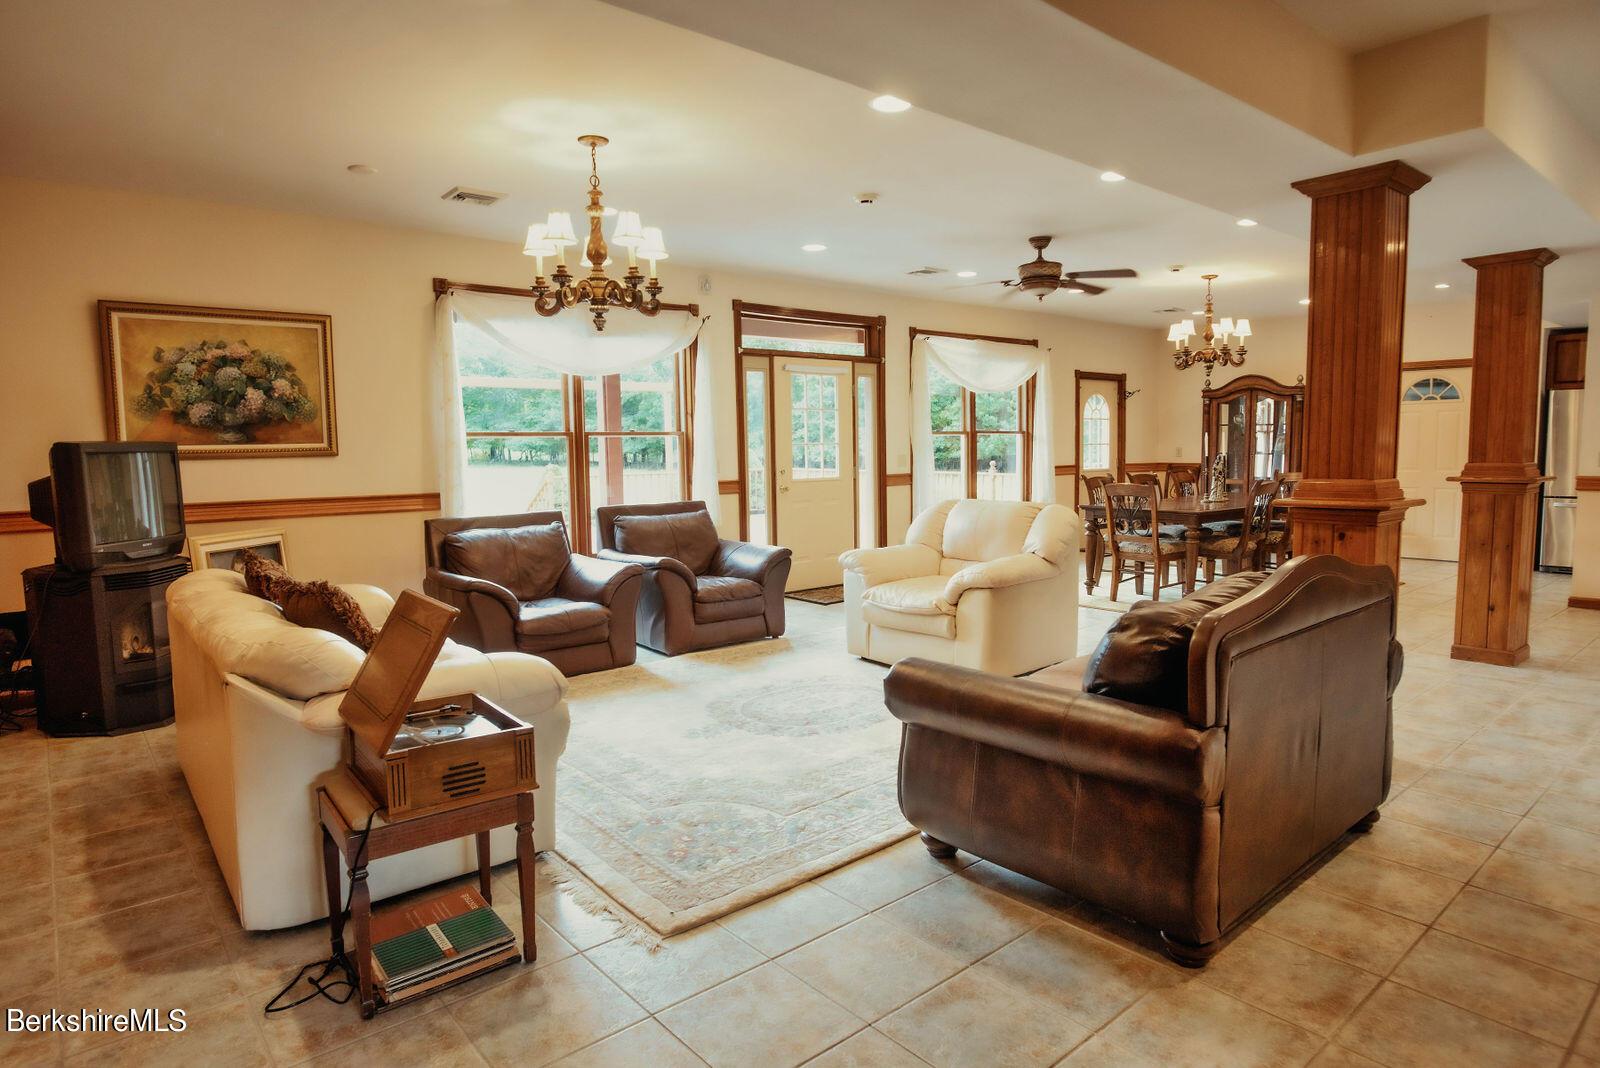 Property located at 404 Winter Clove Rd Cairo NY 12413 photo